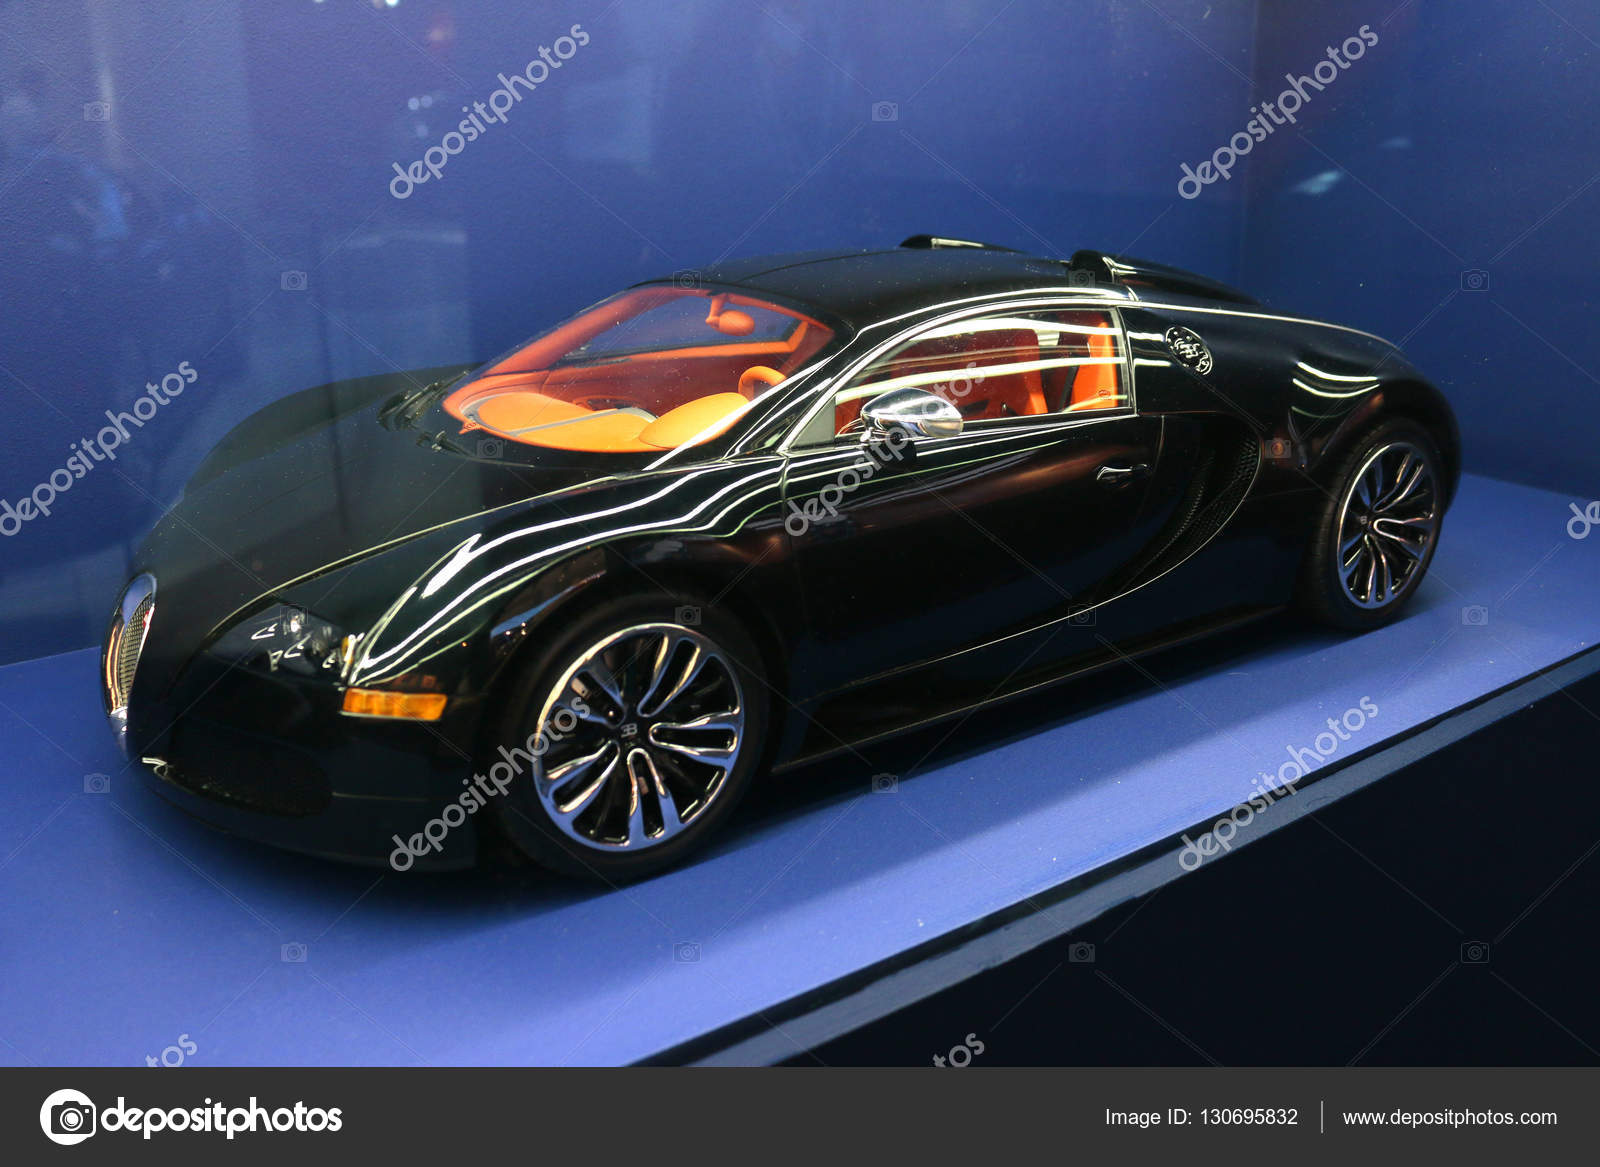 Bugatti Veyron Zdjecia on bugatti cars, bugatti veron, bugatti speed, bugatti motorcycle, bugatti vitesse, bugatti suv, bugatti eb110, bugatti type 57, bugatti galibier, bugatti limousine, bugatti truck, bugatti aventador, bugatti z type, bugatti logo, bugatti 4 door, bugatti coloring pages, bugatti venom, bugatti chiron, bugatti chrome, bugatti adder,